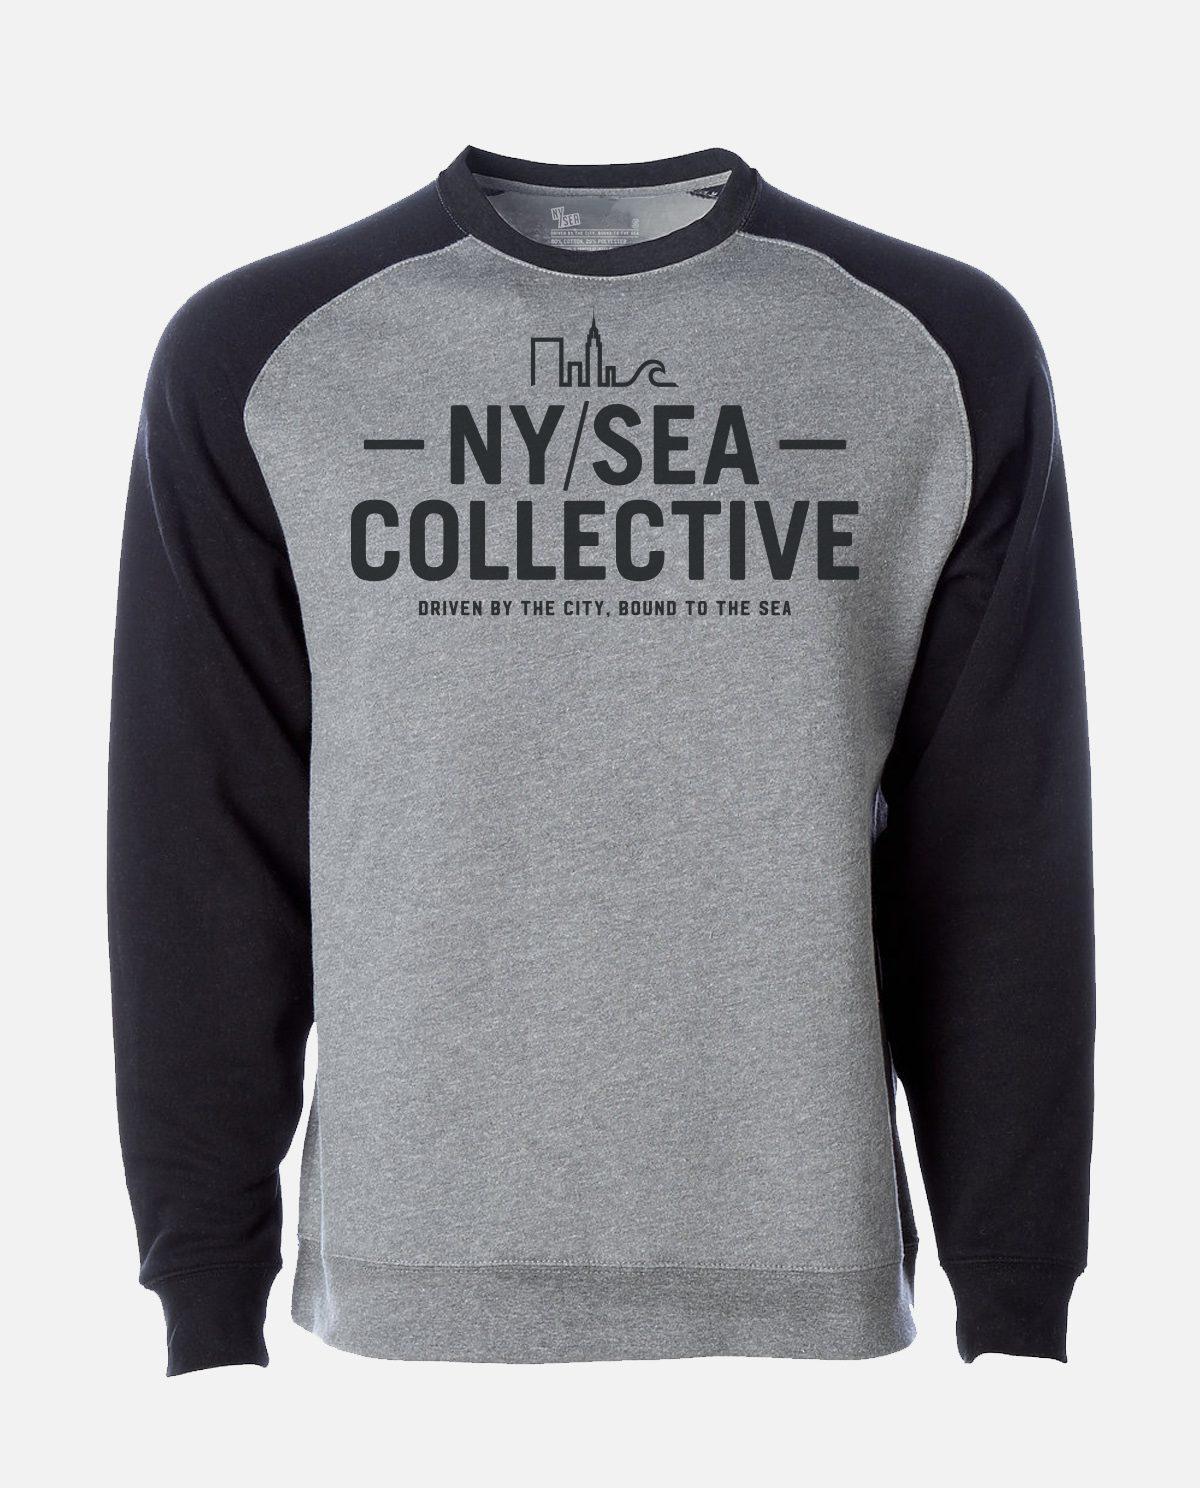 nysea-20wintercollection_collective-crew-black